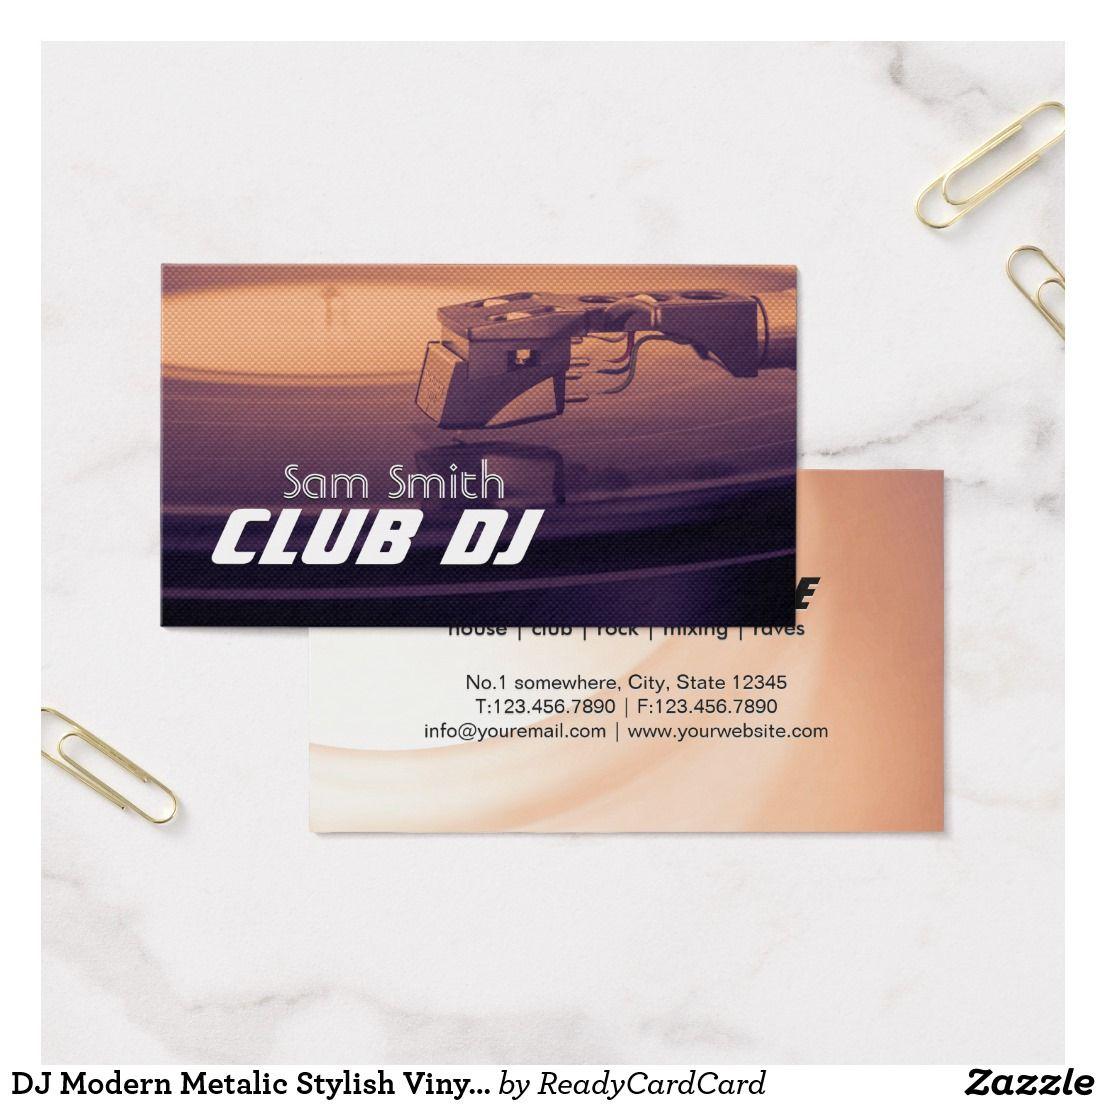 Dj modern metalic stylish vinyl recoder mixer business card dj dj modern metalic stylish vinyl recoder mixer business card reheart Image collections